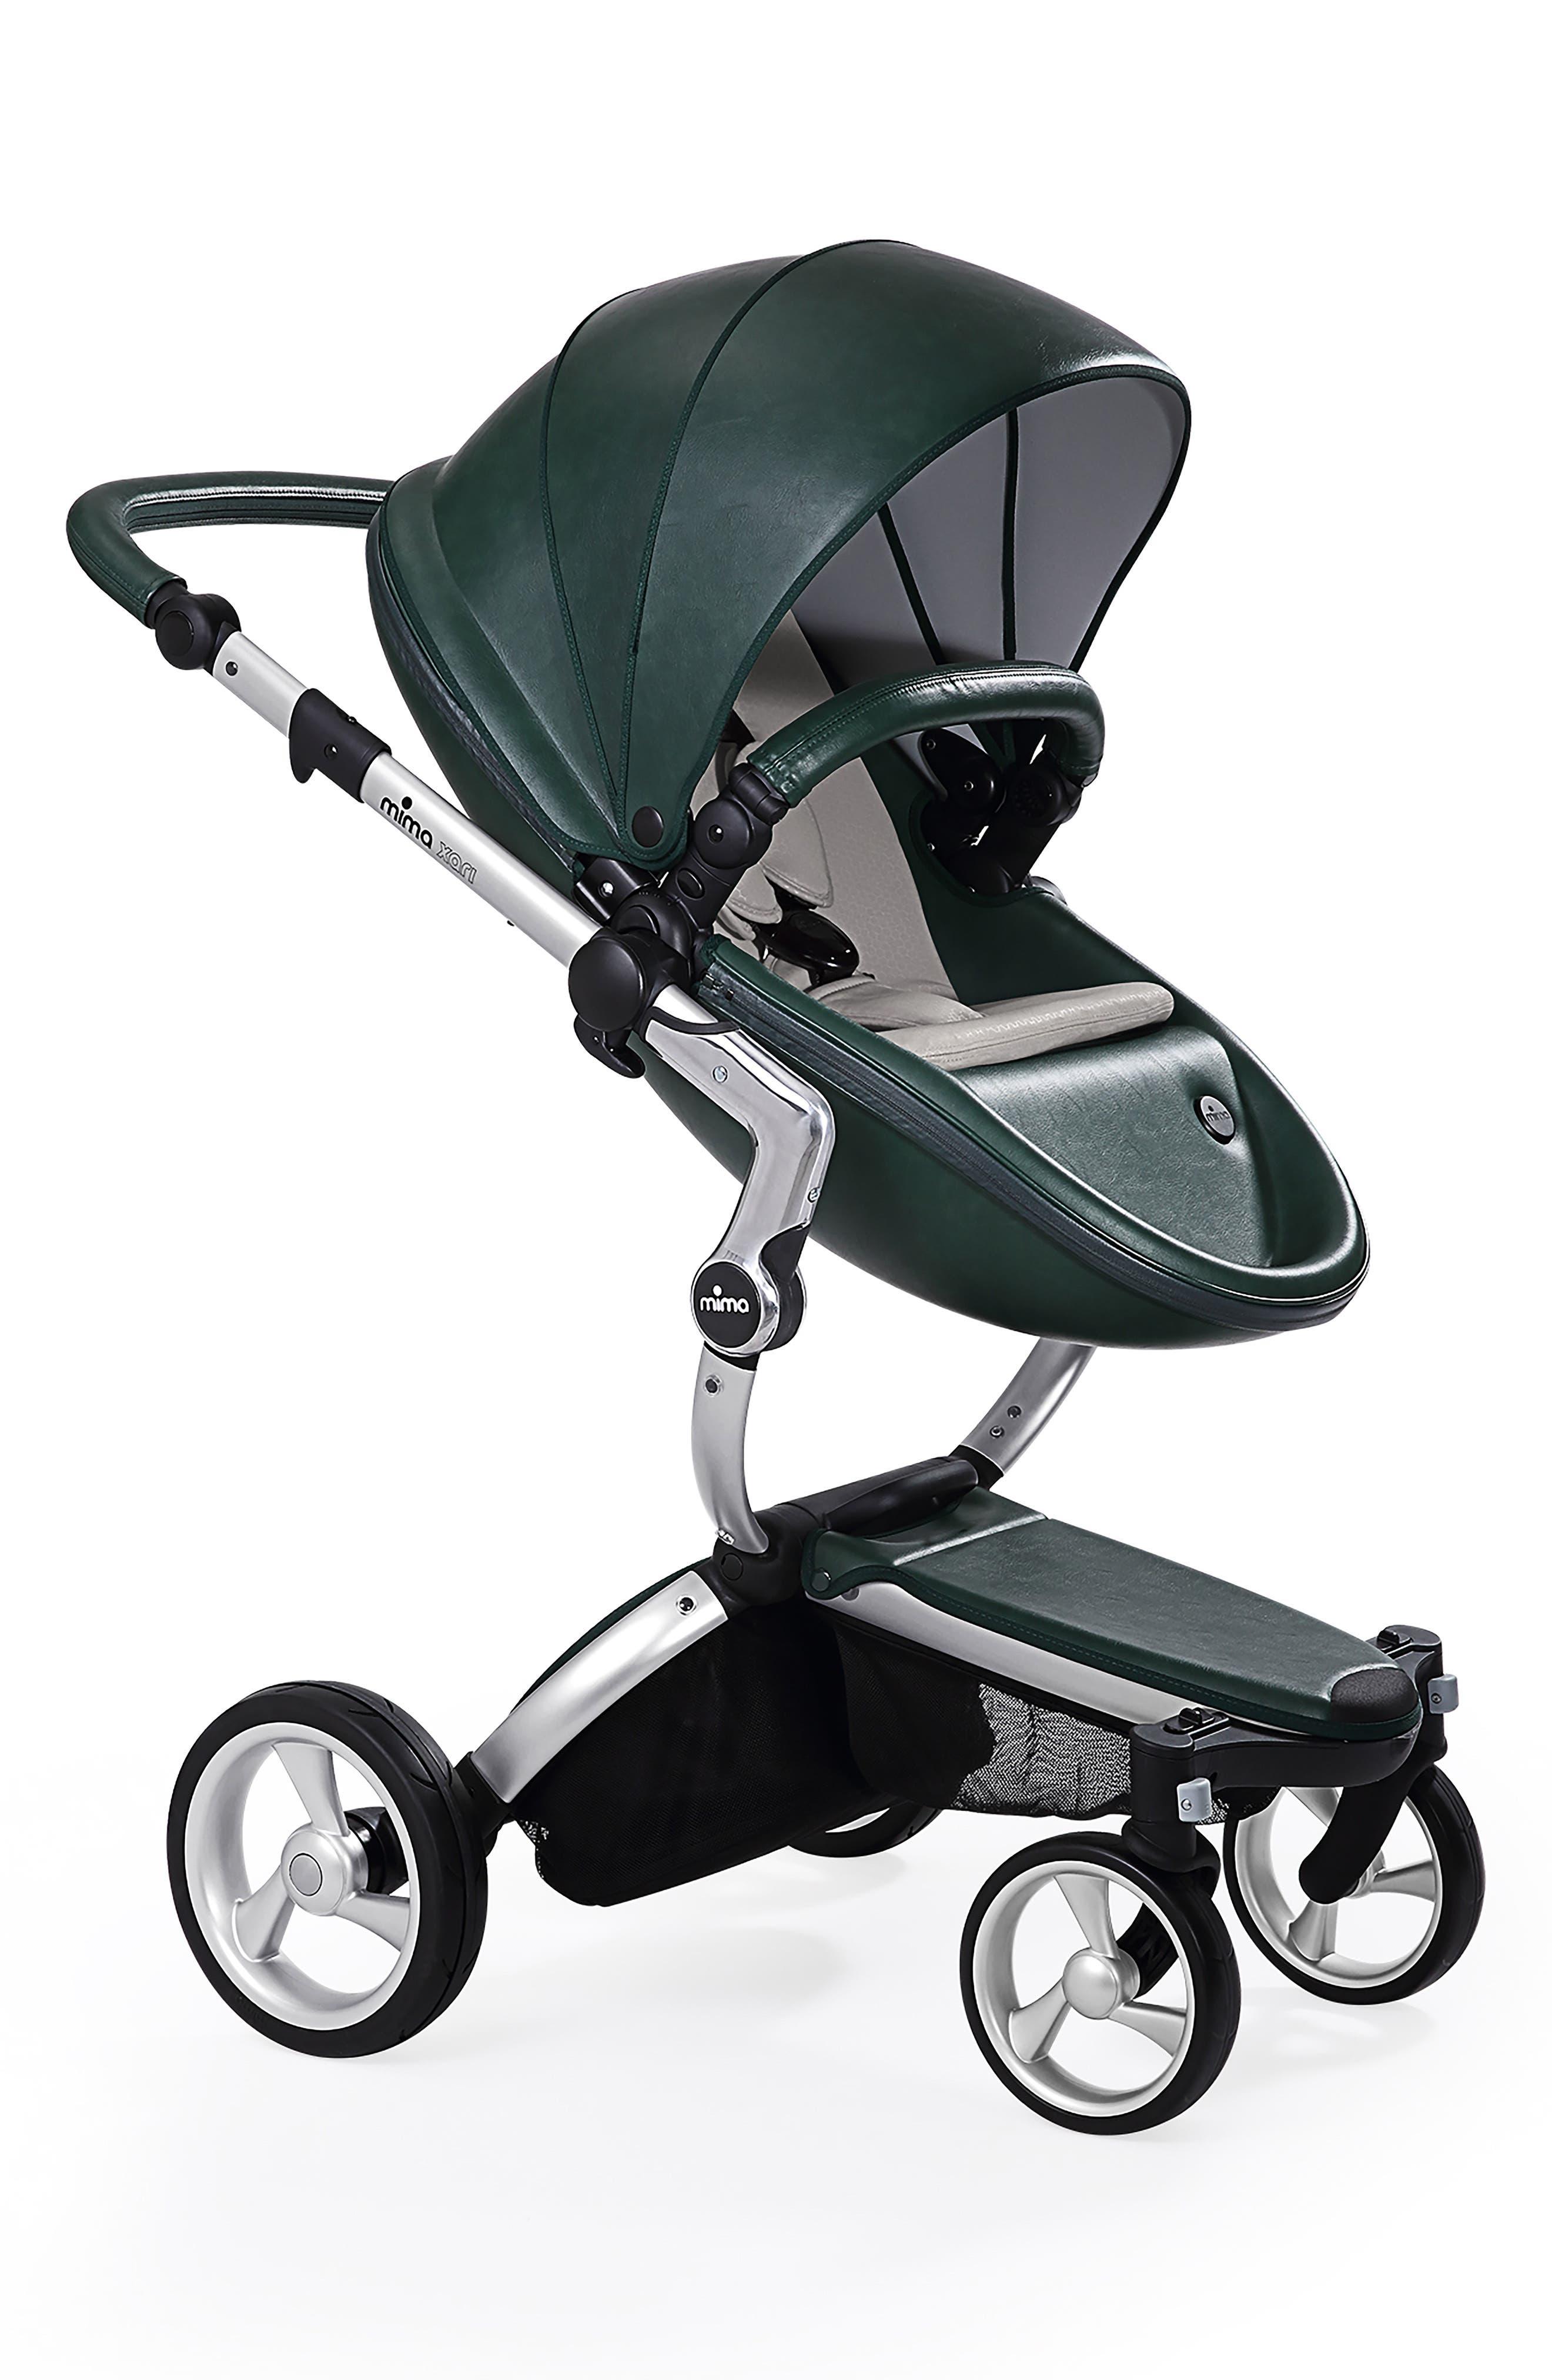 Mima Xari Aluminum Frame Stroller with Reversible Reclining Seat & Carrycot